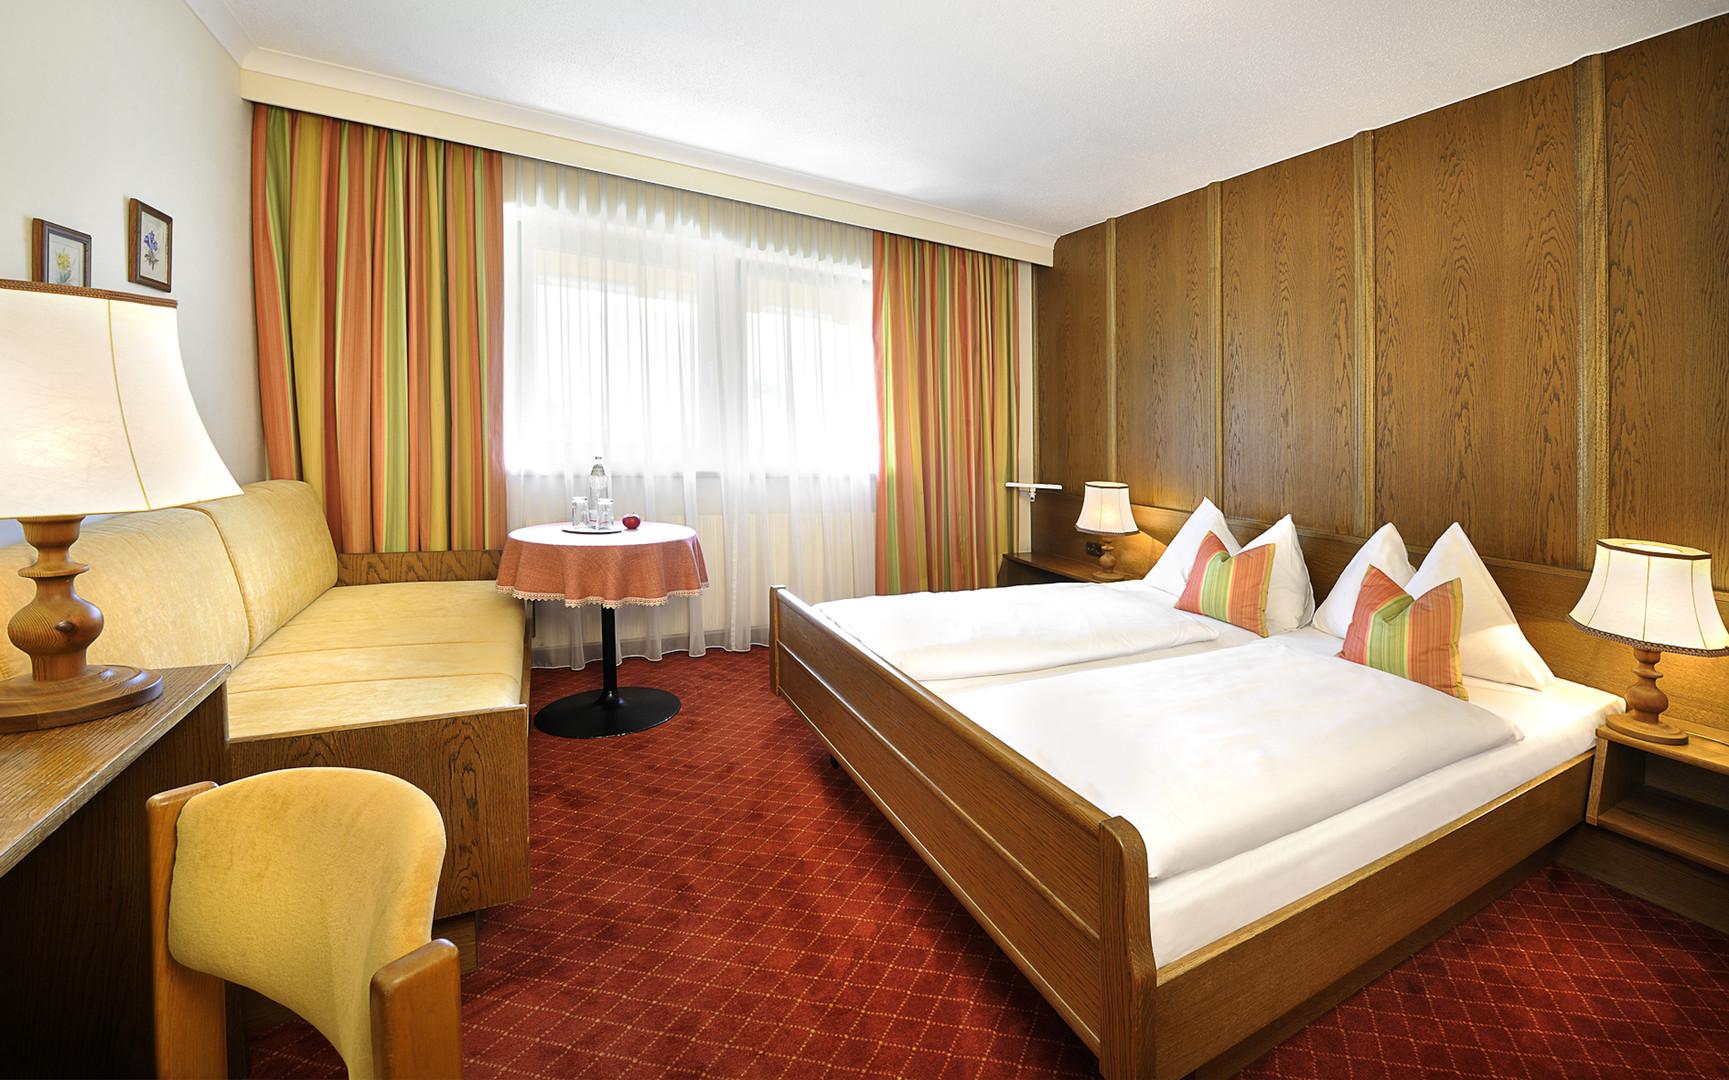 Hotel St. Hubertus Lofer #4